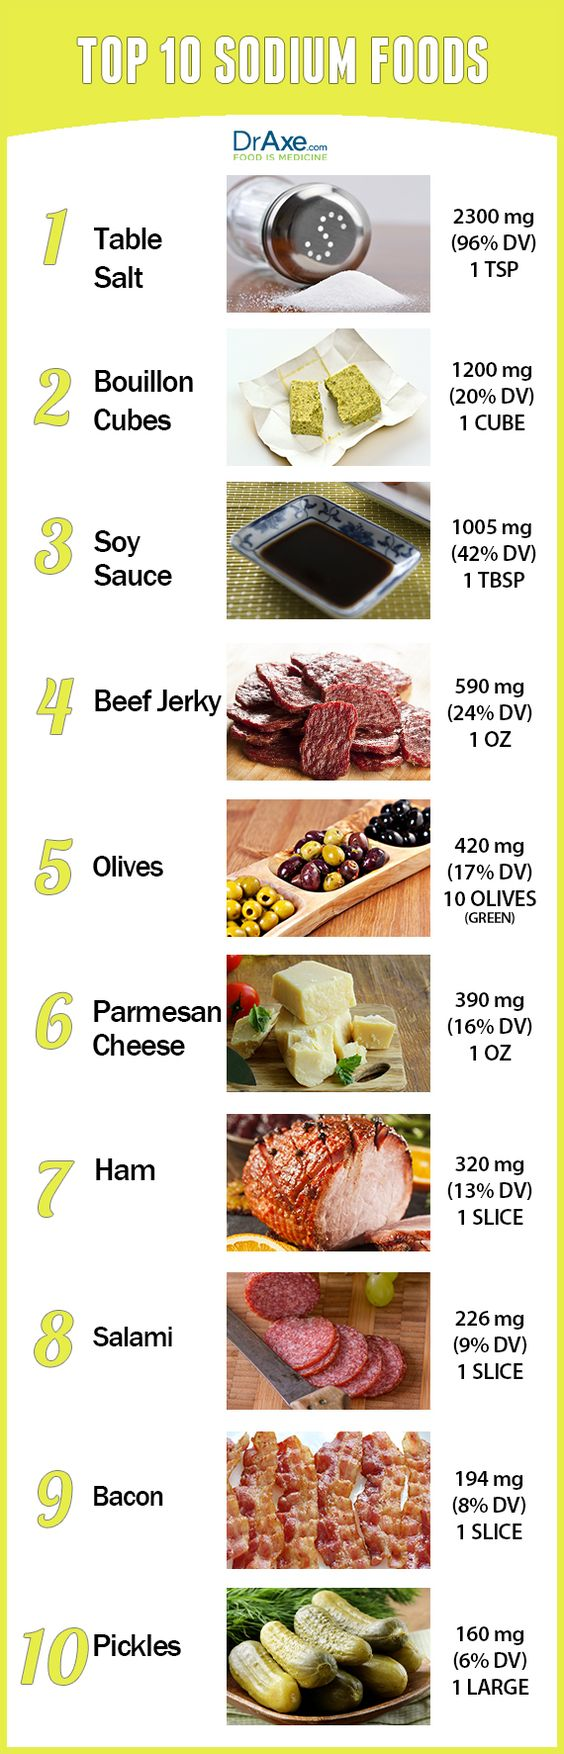 high sodium foods  http://www.draxe.com #health #holistic #natural